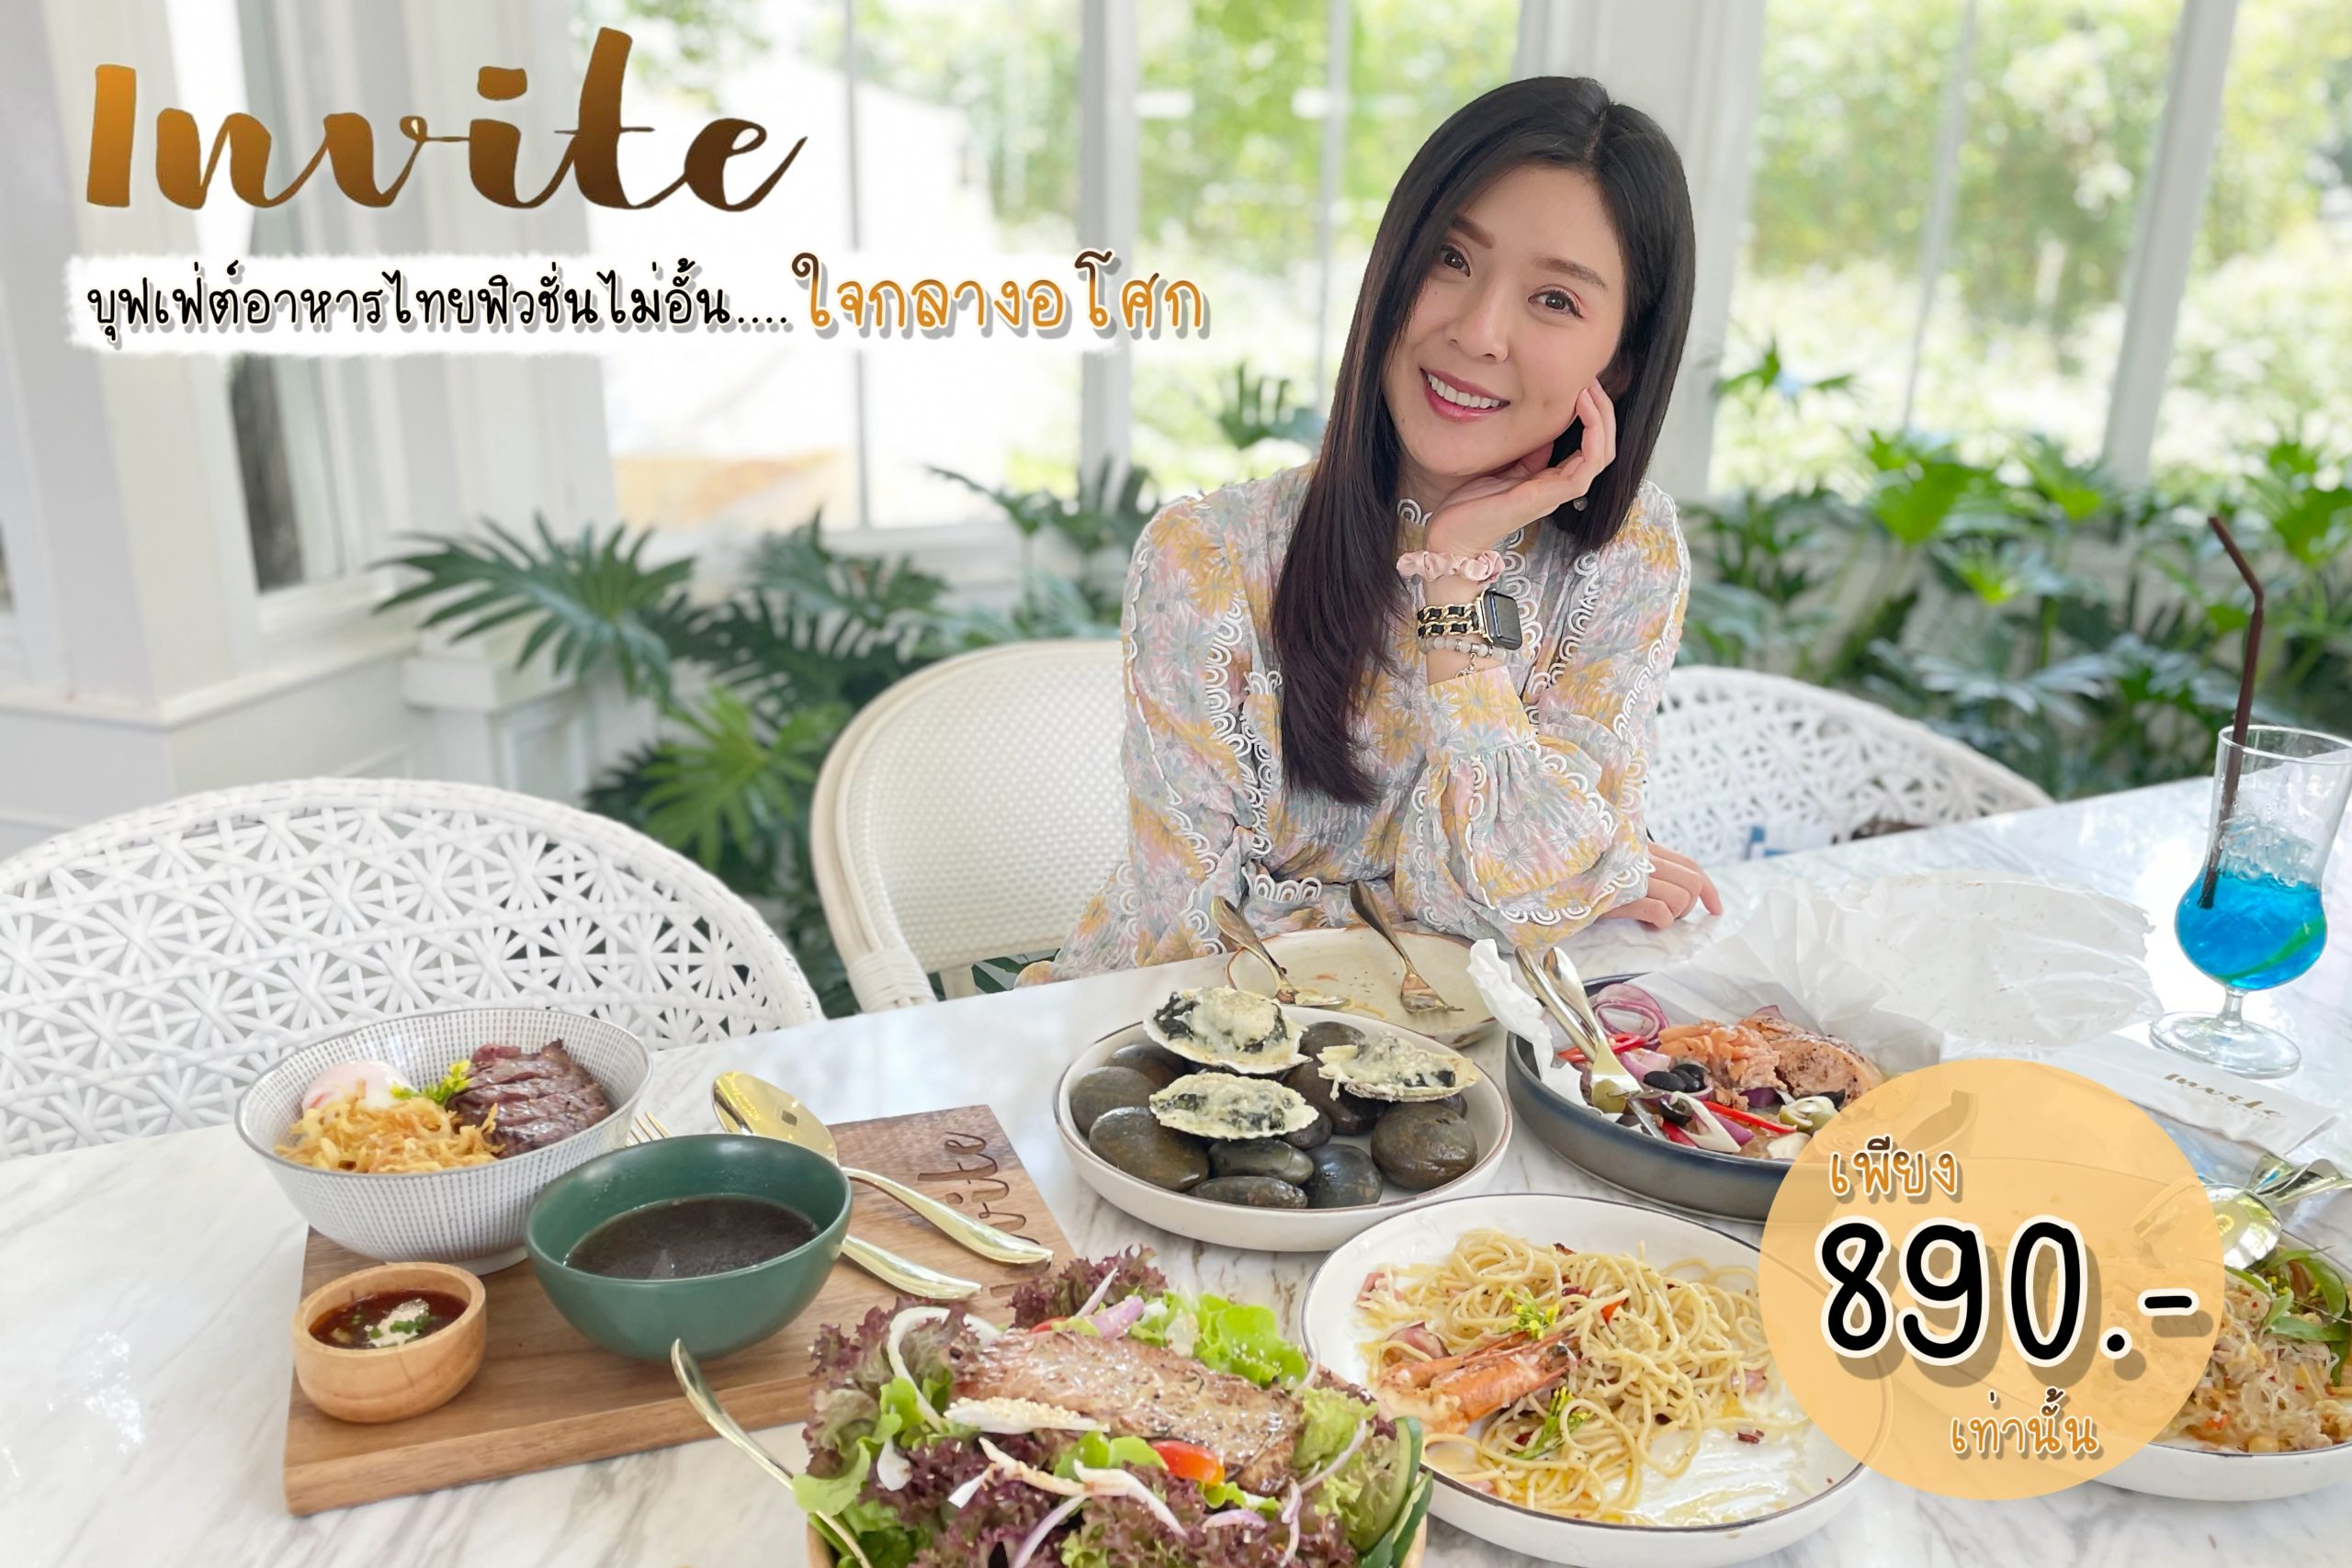 invite ร้านอาหาร